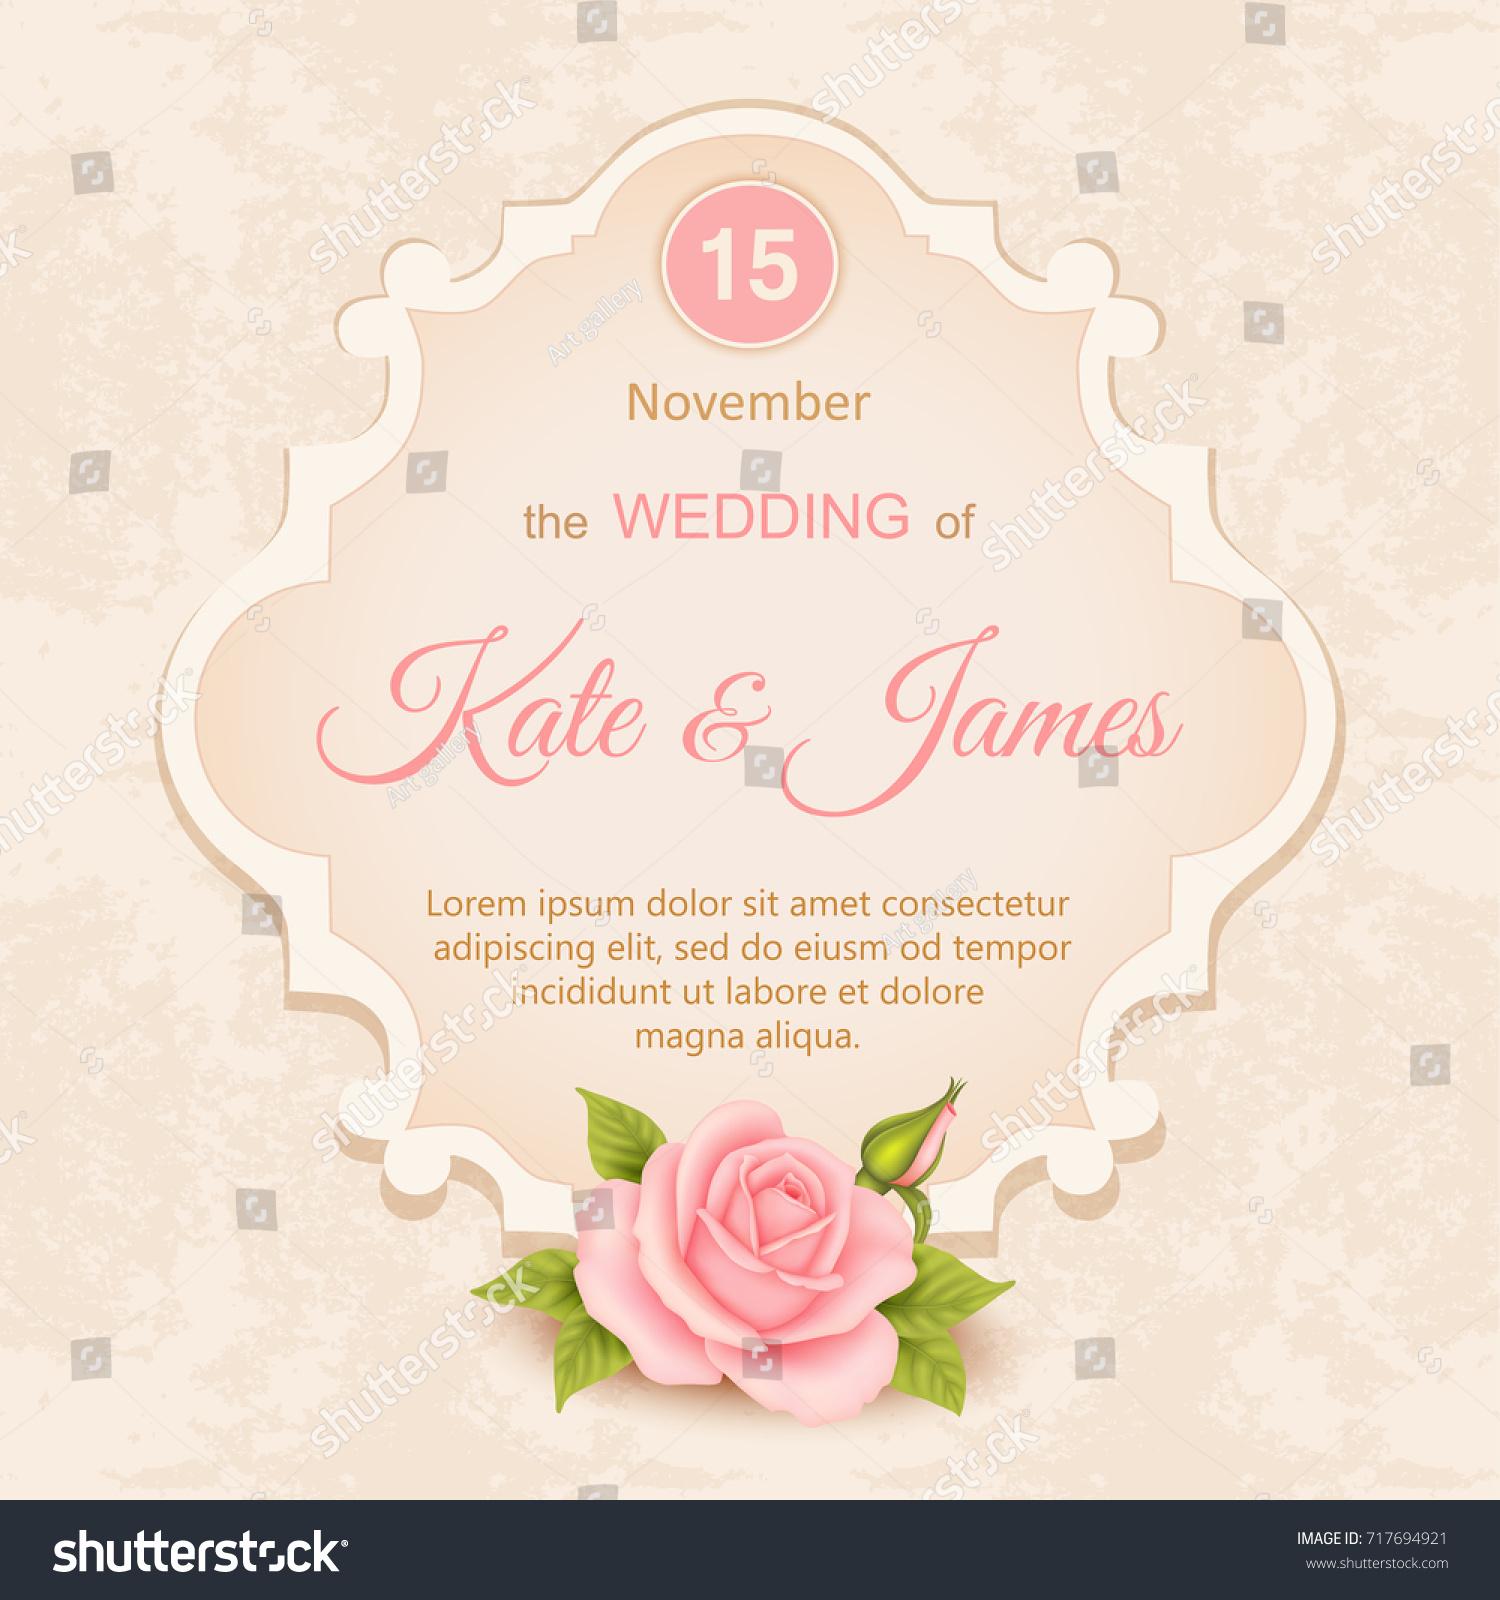 Vector Vintage Wedding Invitation Roses Stock Vector 717694921